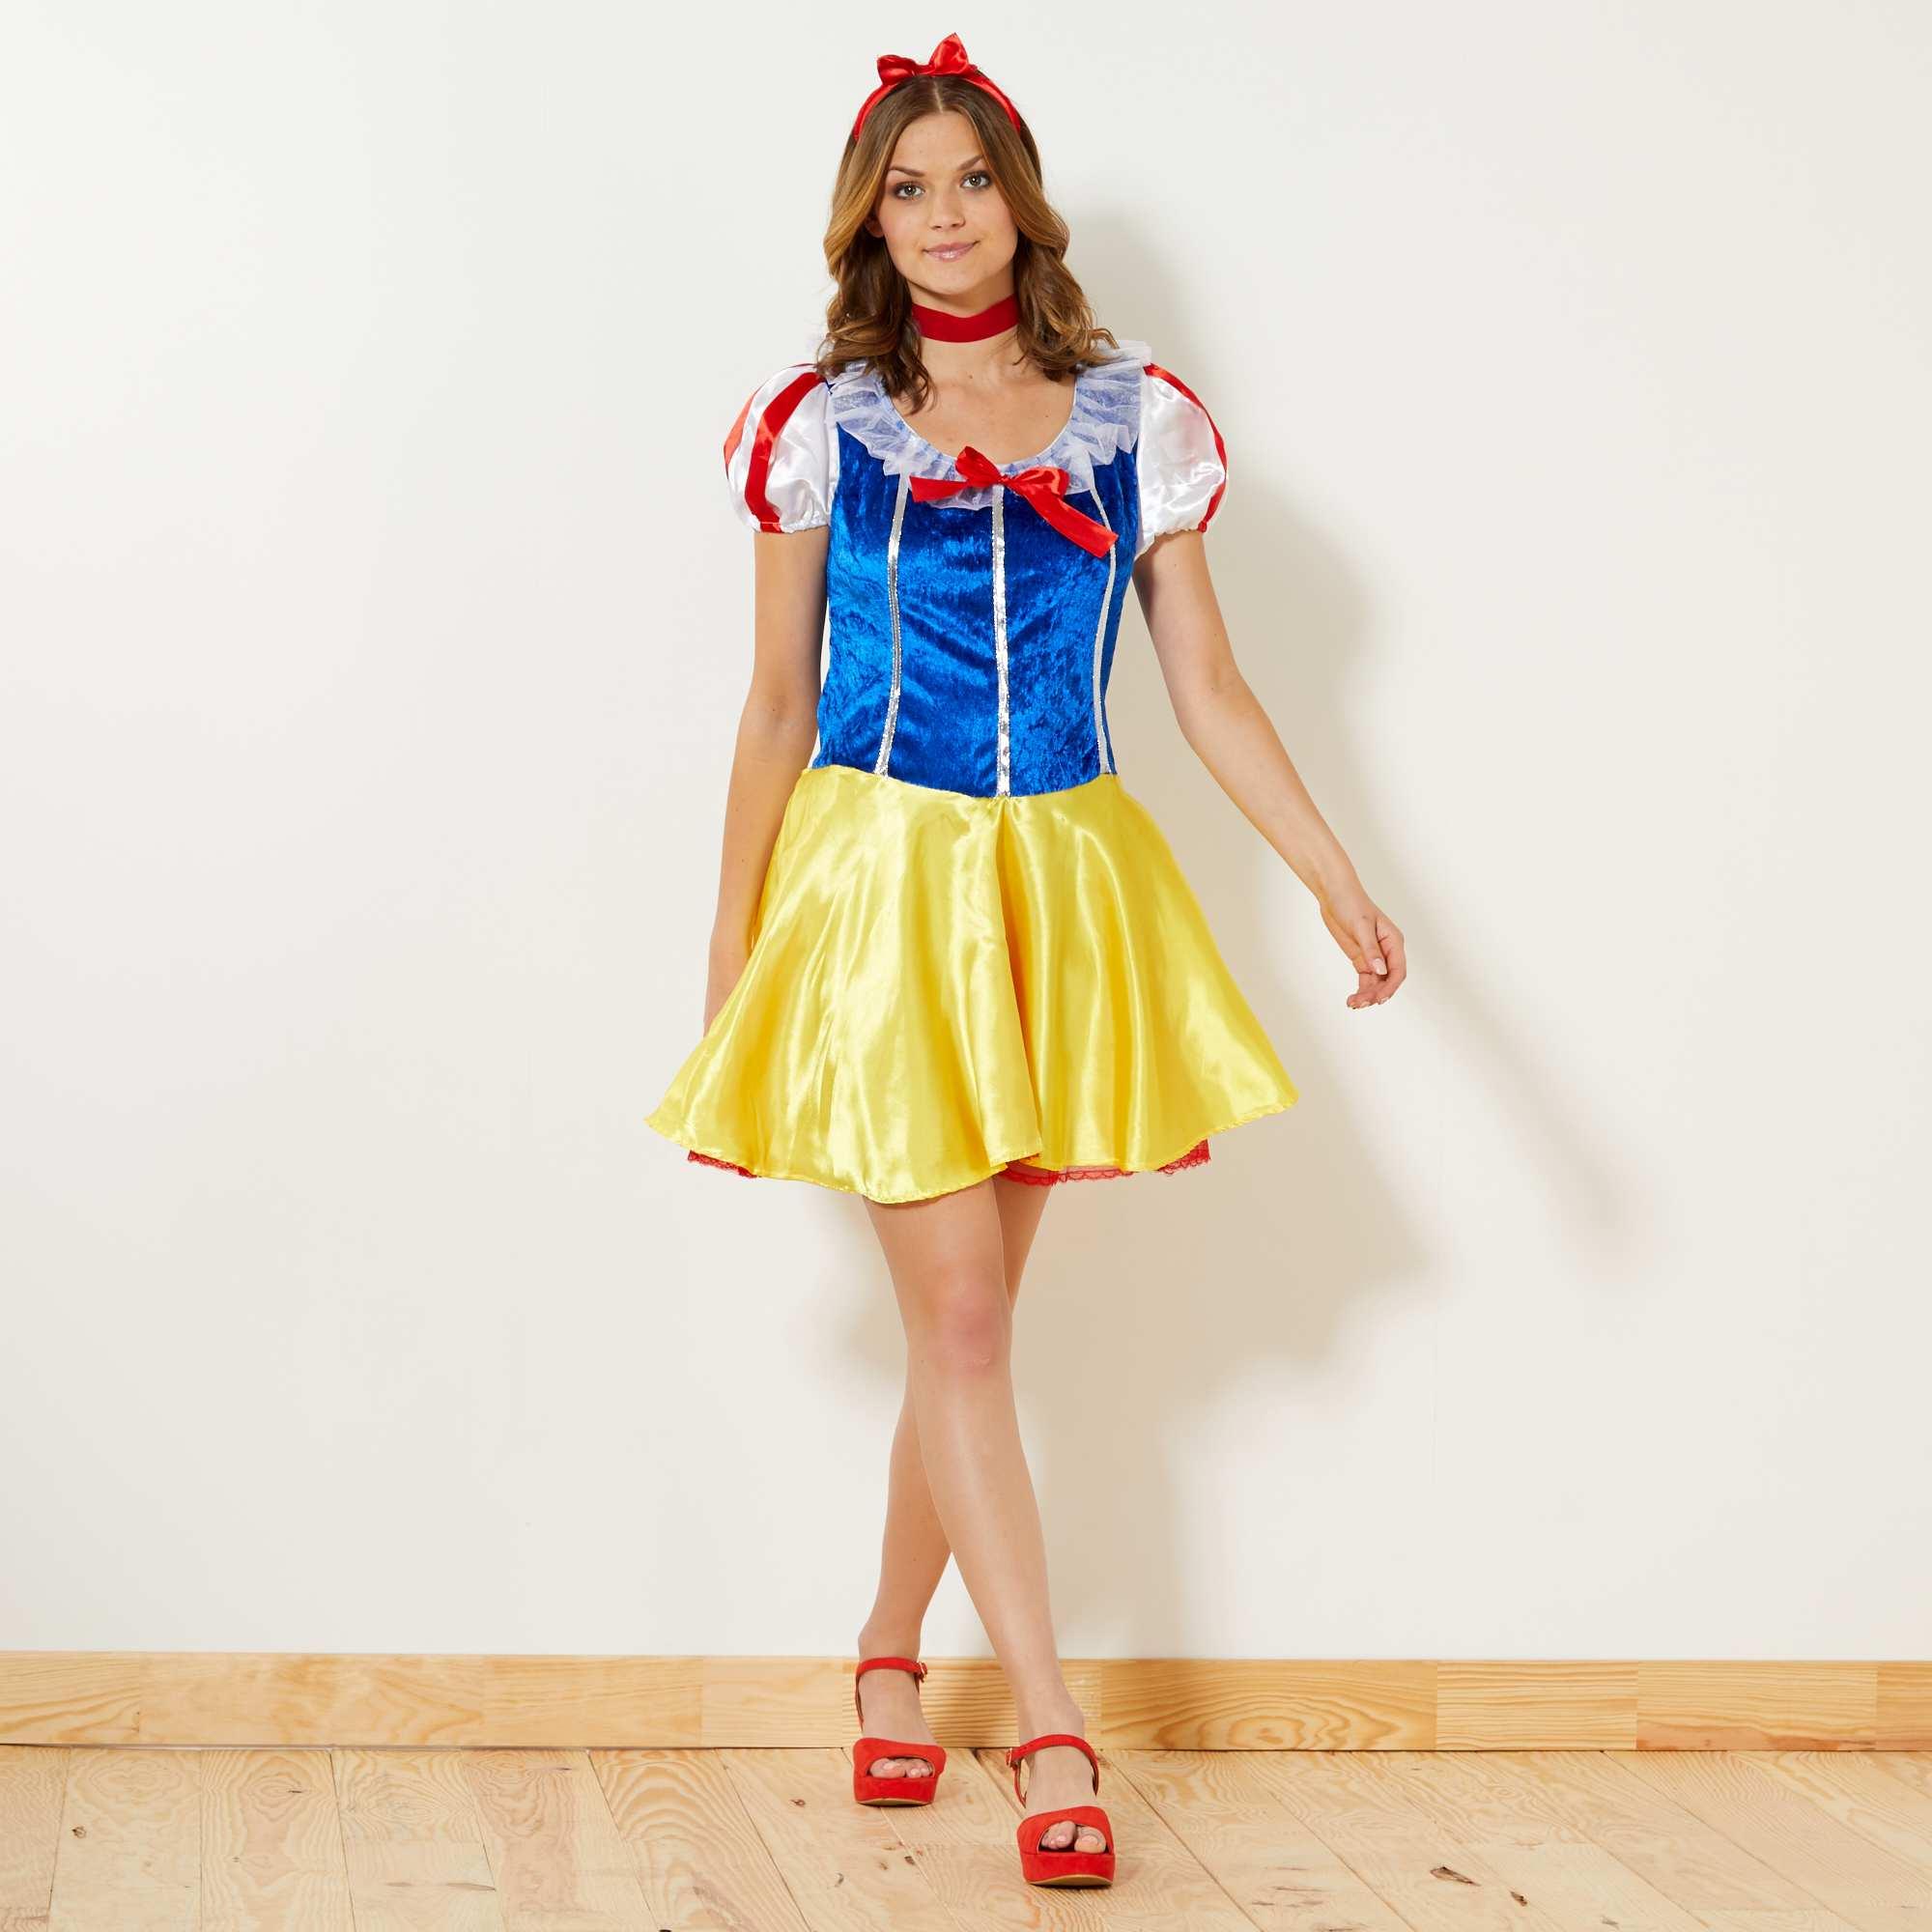 f7be9c184c7 Disfraz de Elsa Mujer - amarillo - Kiabi - 23